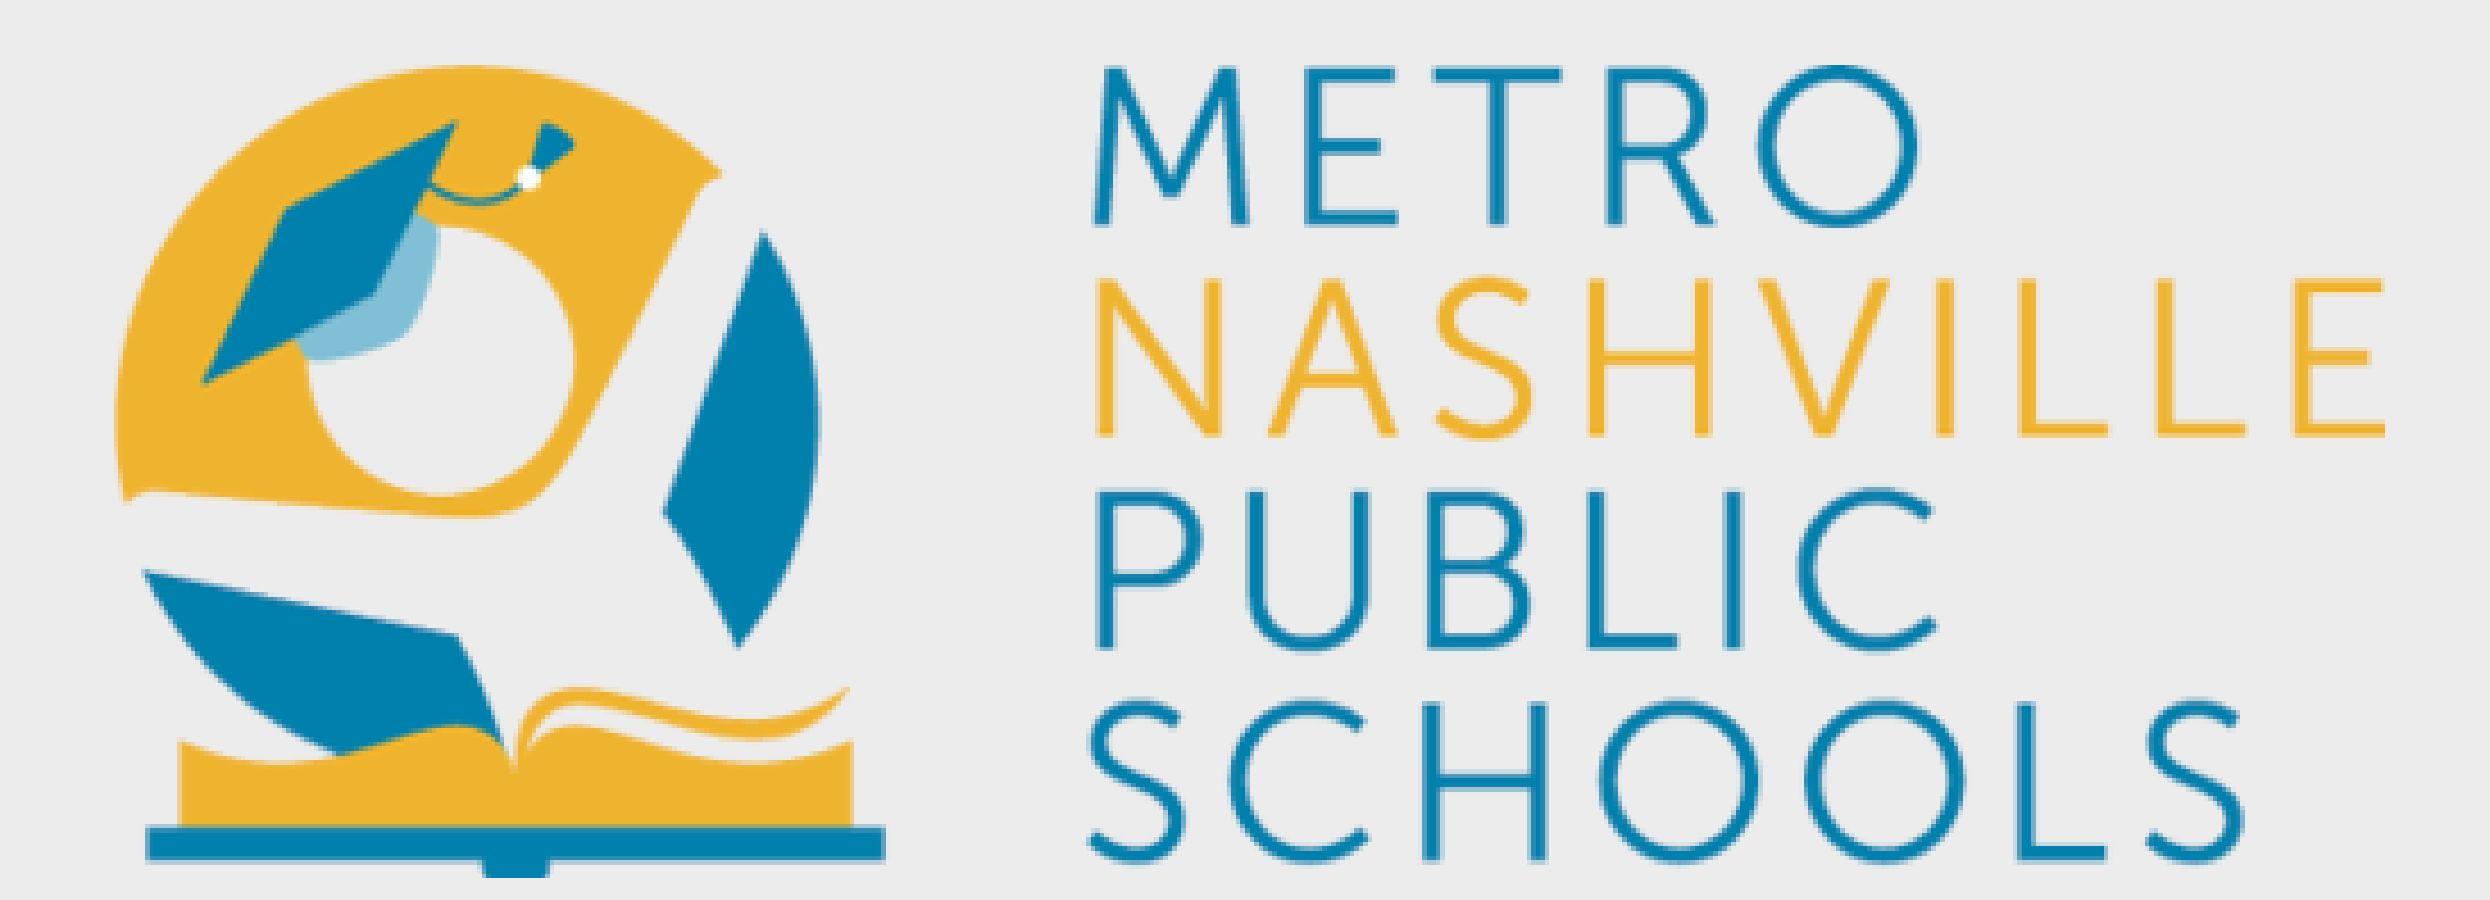 Metro Nashville Public Schools logo